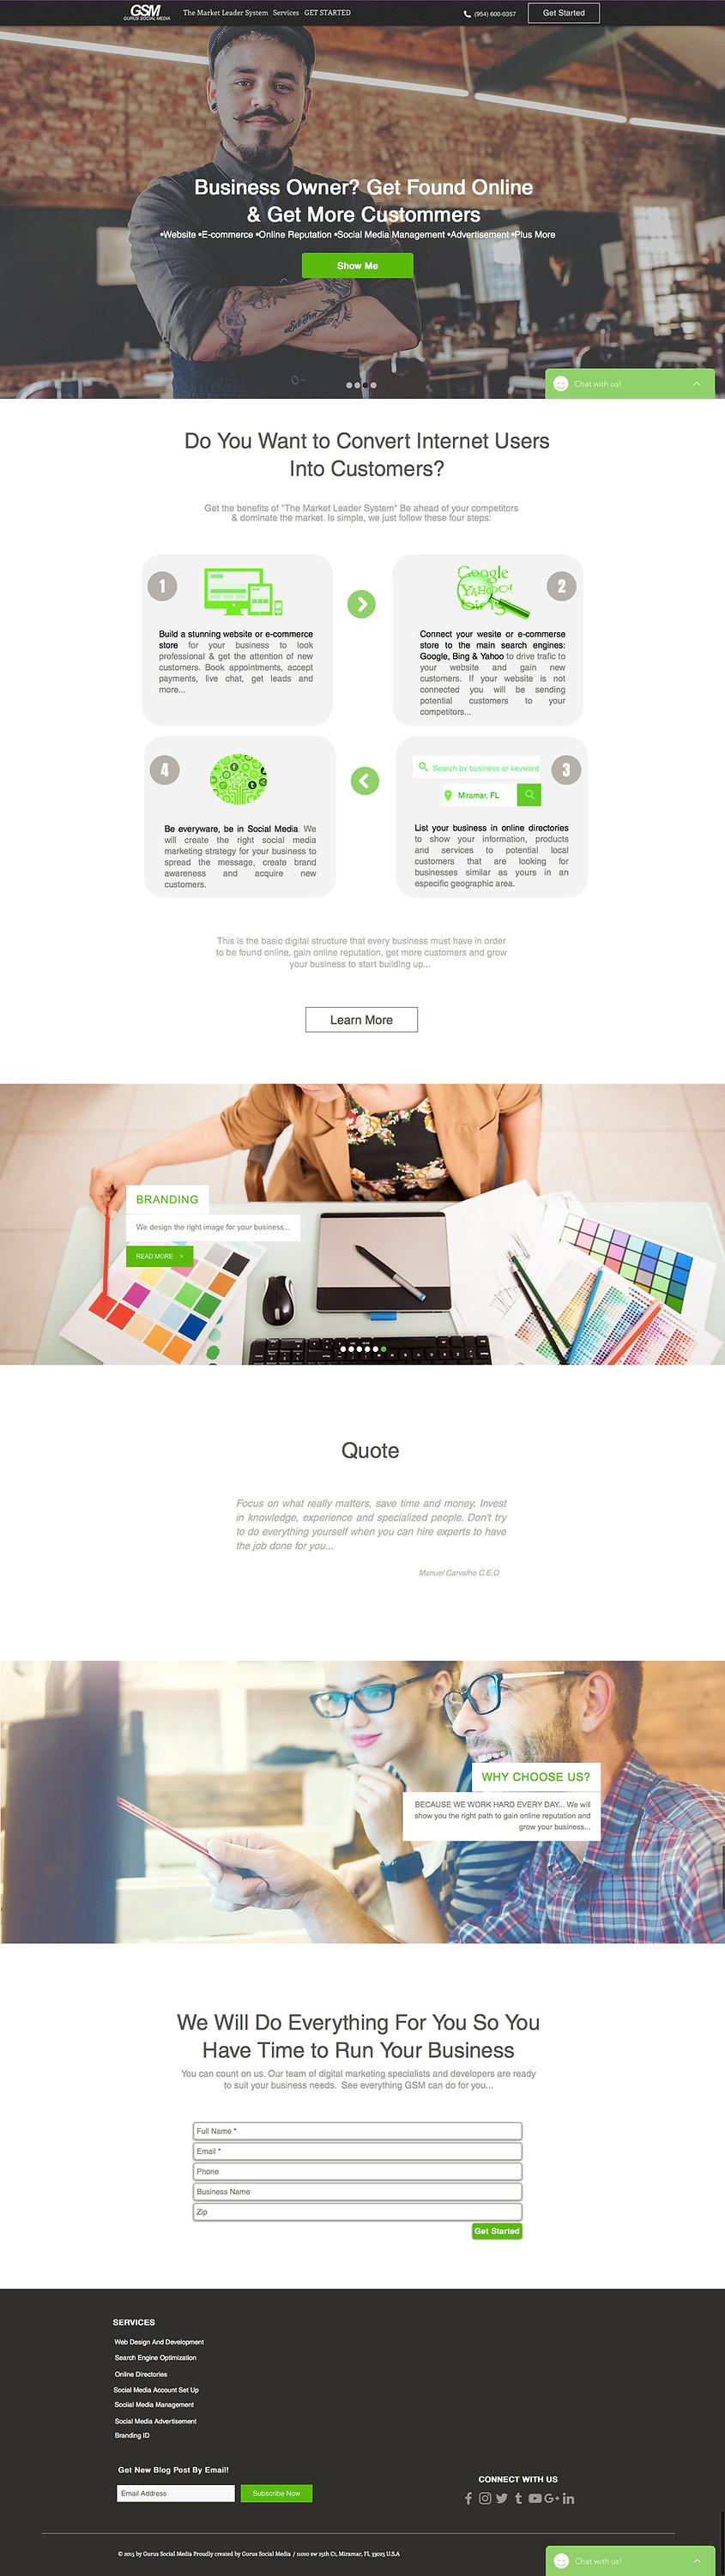 website-design-marketing-agency-pembroke-pines.jpg